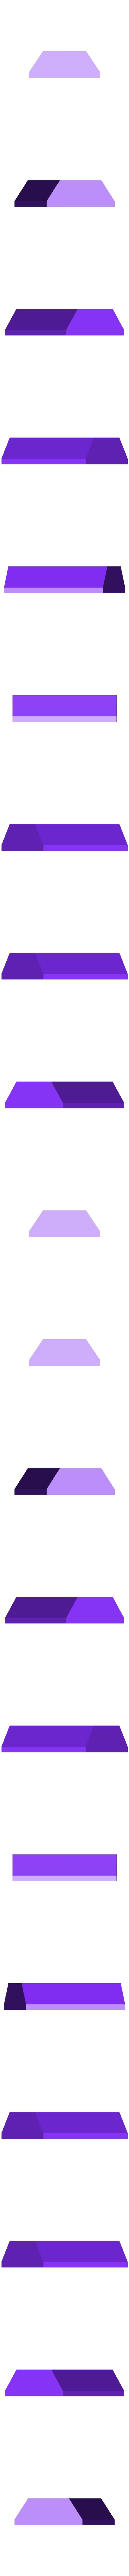 06- Fuselage pin.stl Download STL file DOUGLAS F4D SKYRAY  • 3D printer object, 3DprintedArmy